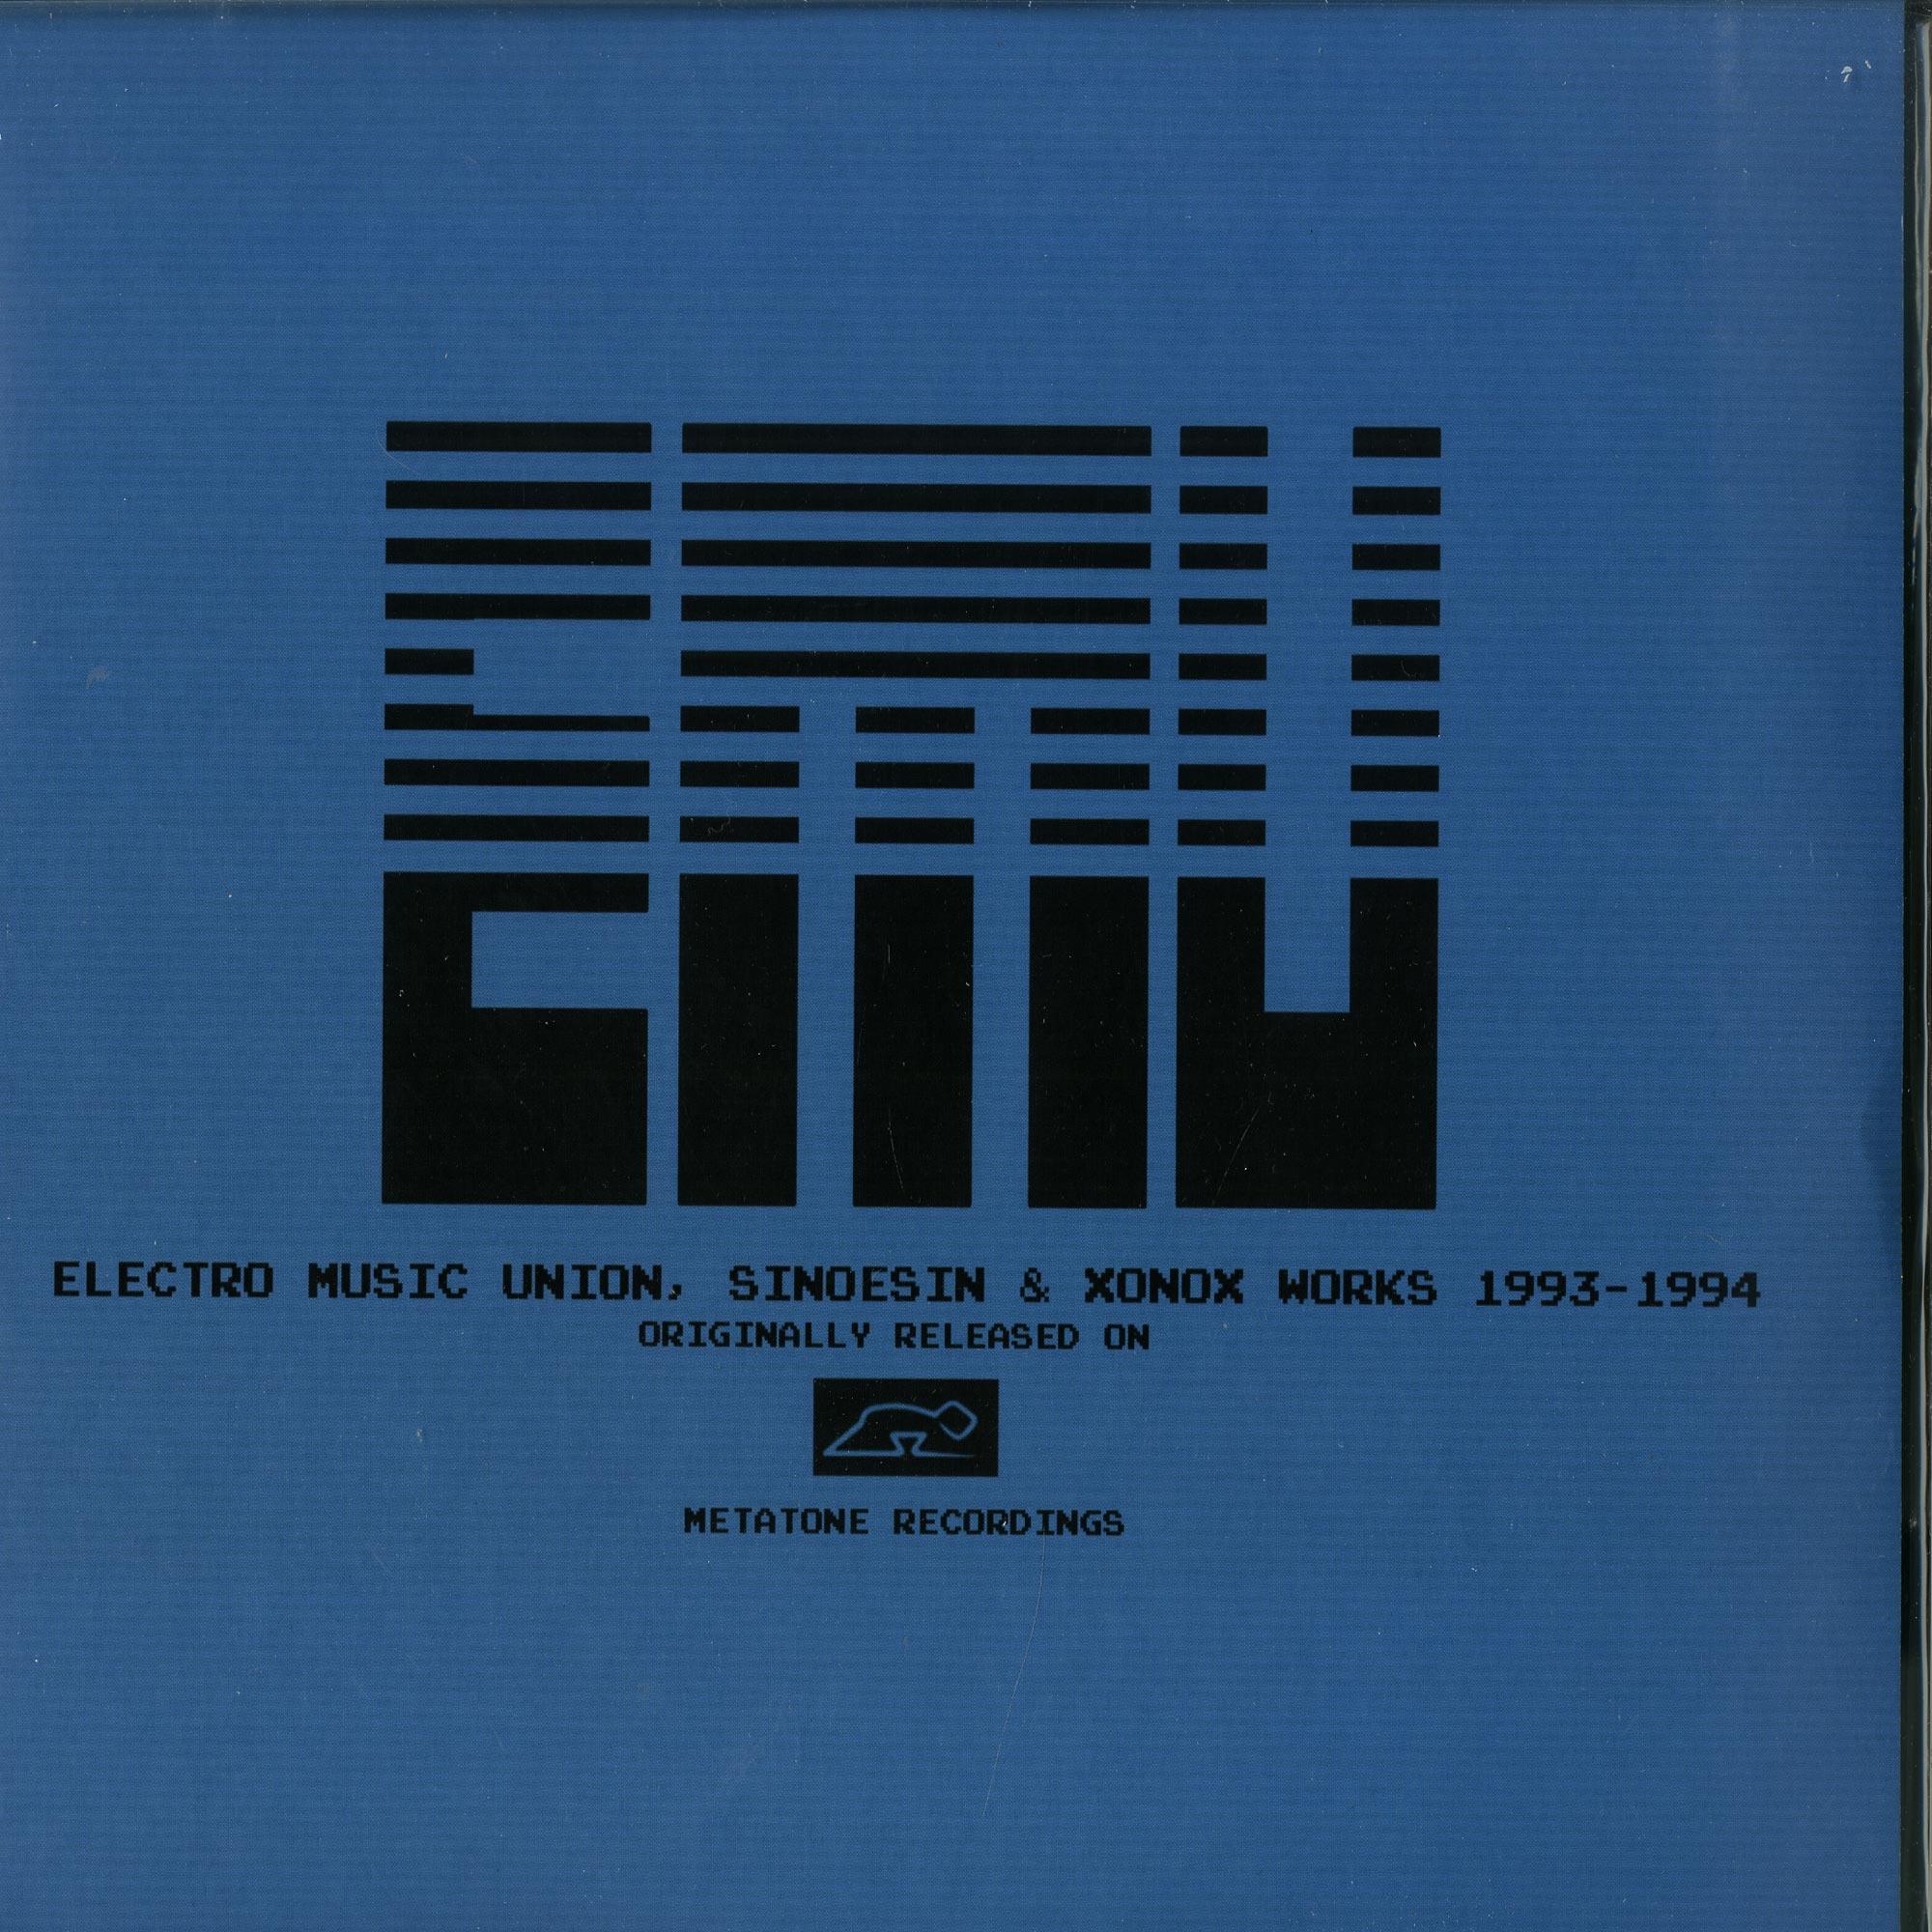 E.M.U. - ELECTRO MUSIC UNION, SINOESIN & XONOX WORKS 1993 - 1994